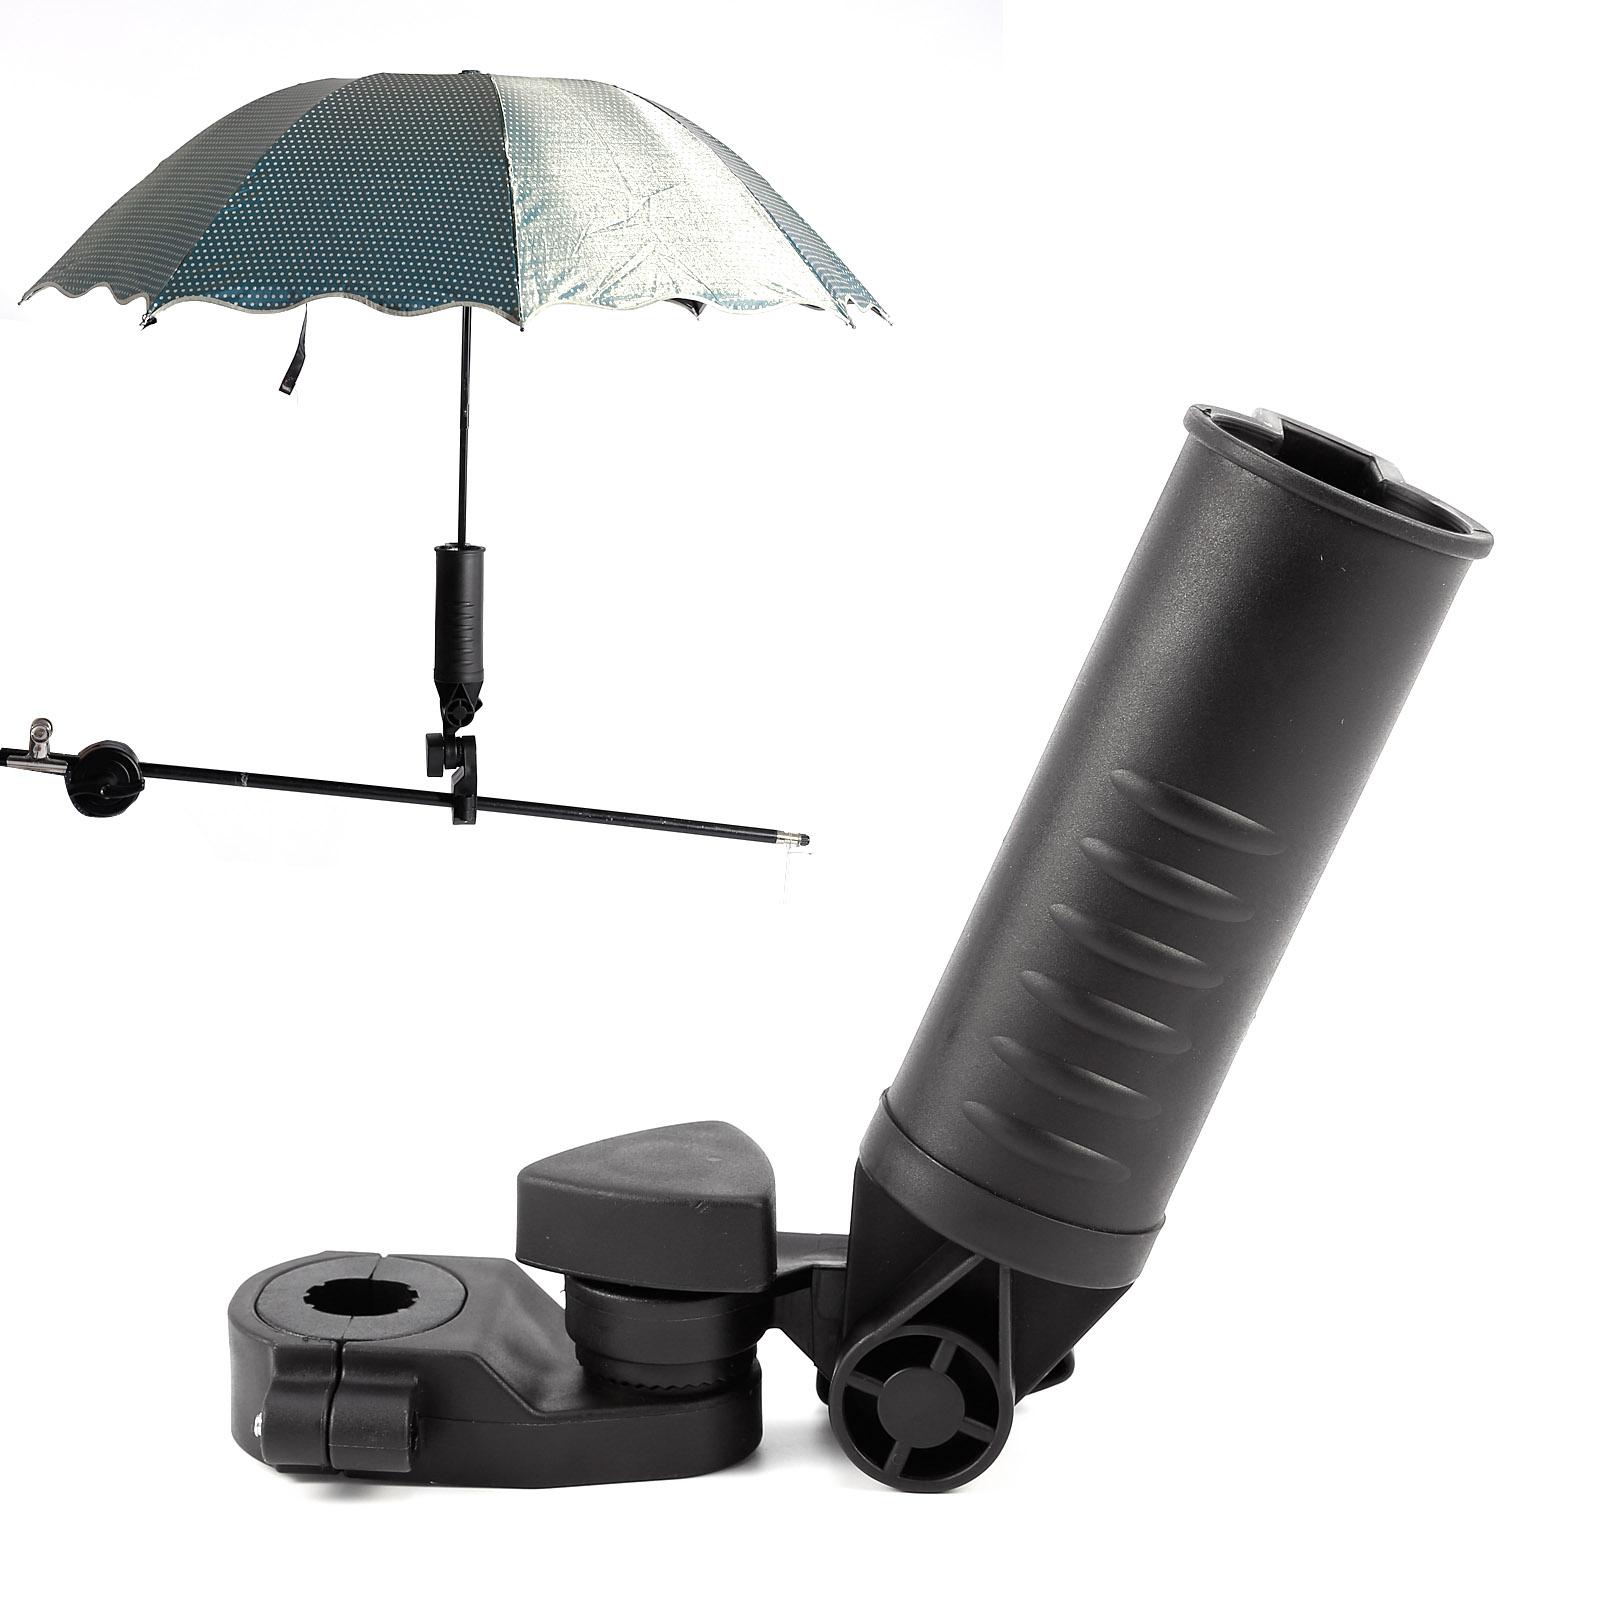 Umbrella Stand Golf: Golf Adjustable Umbrella Holder Mount Stand